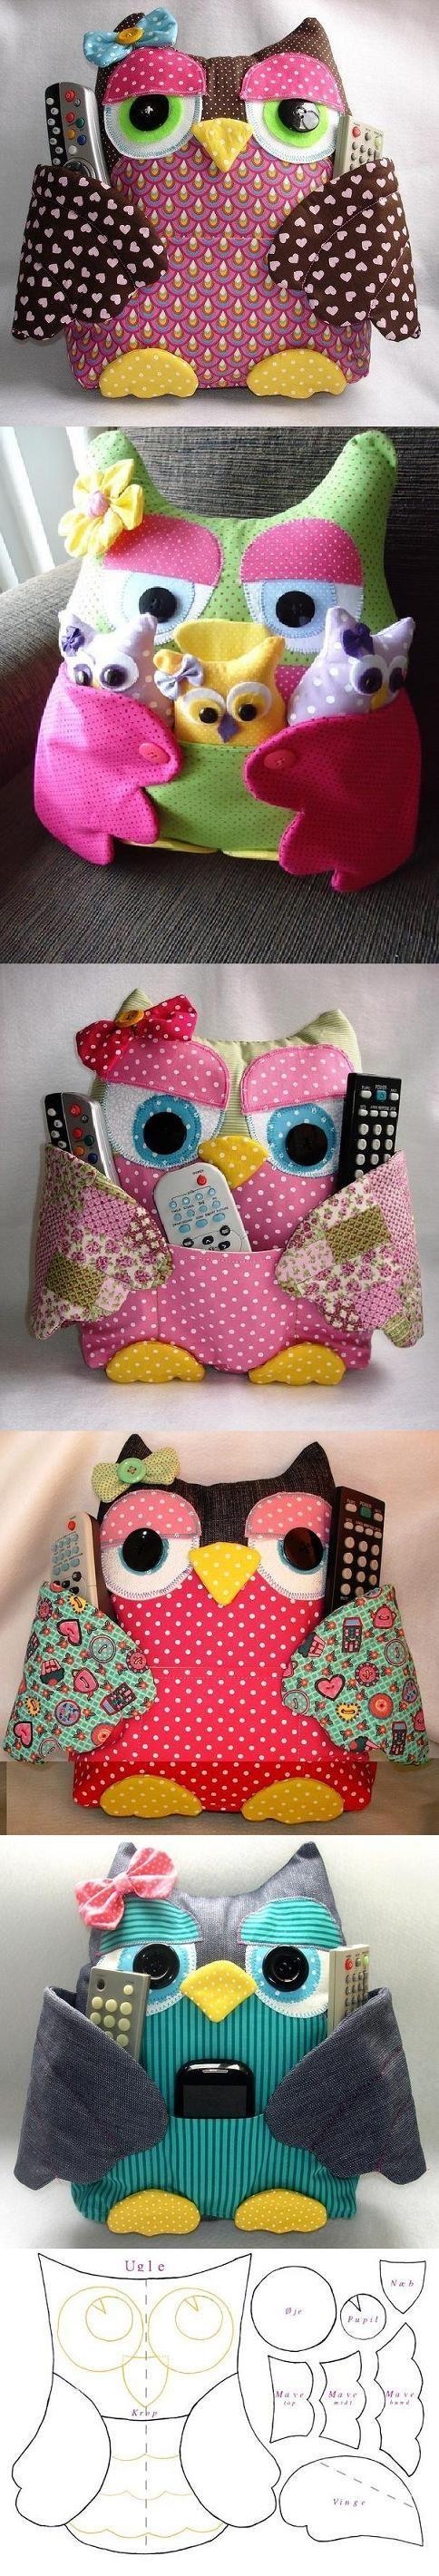 DIY Owl Pad with Pockets